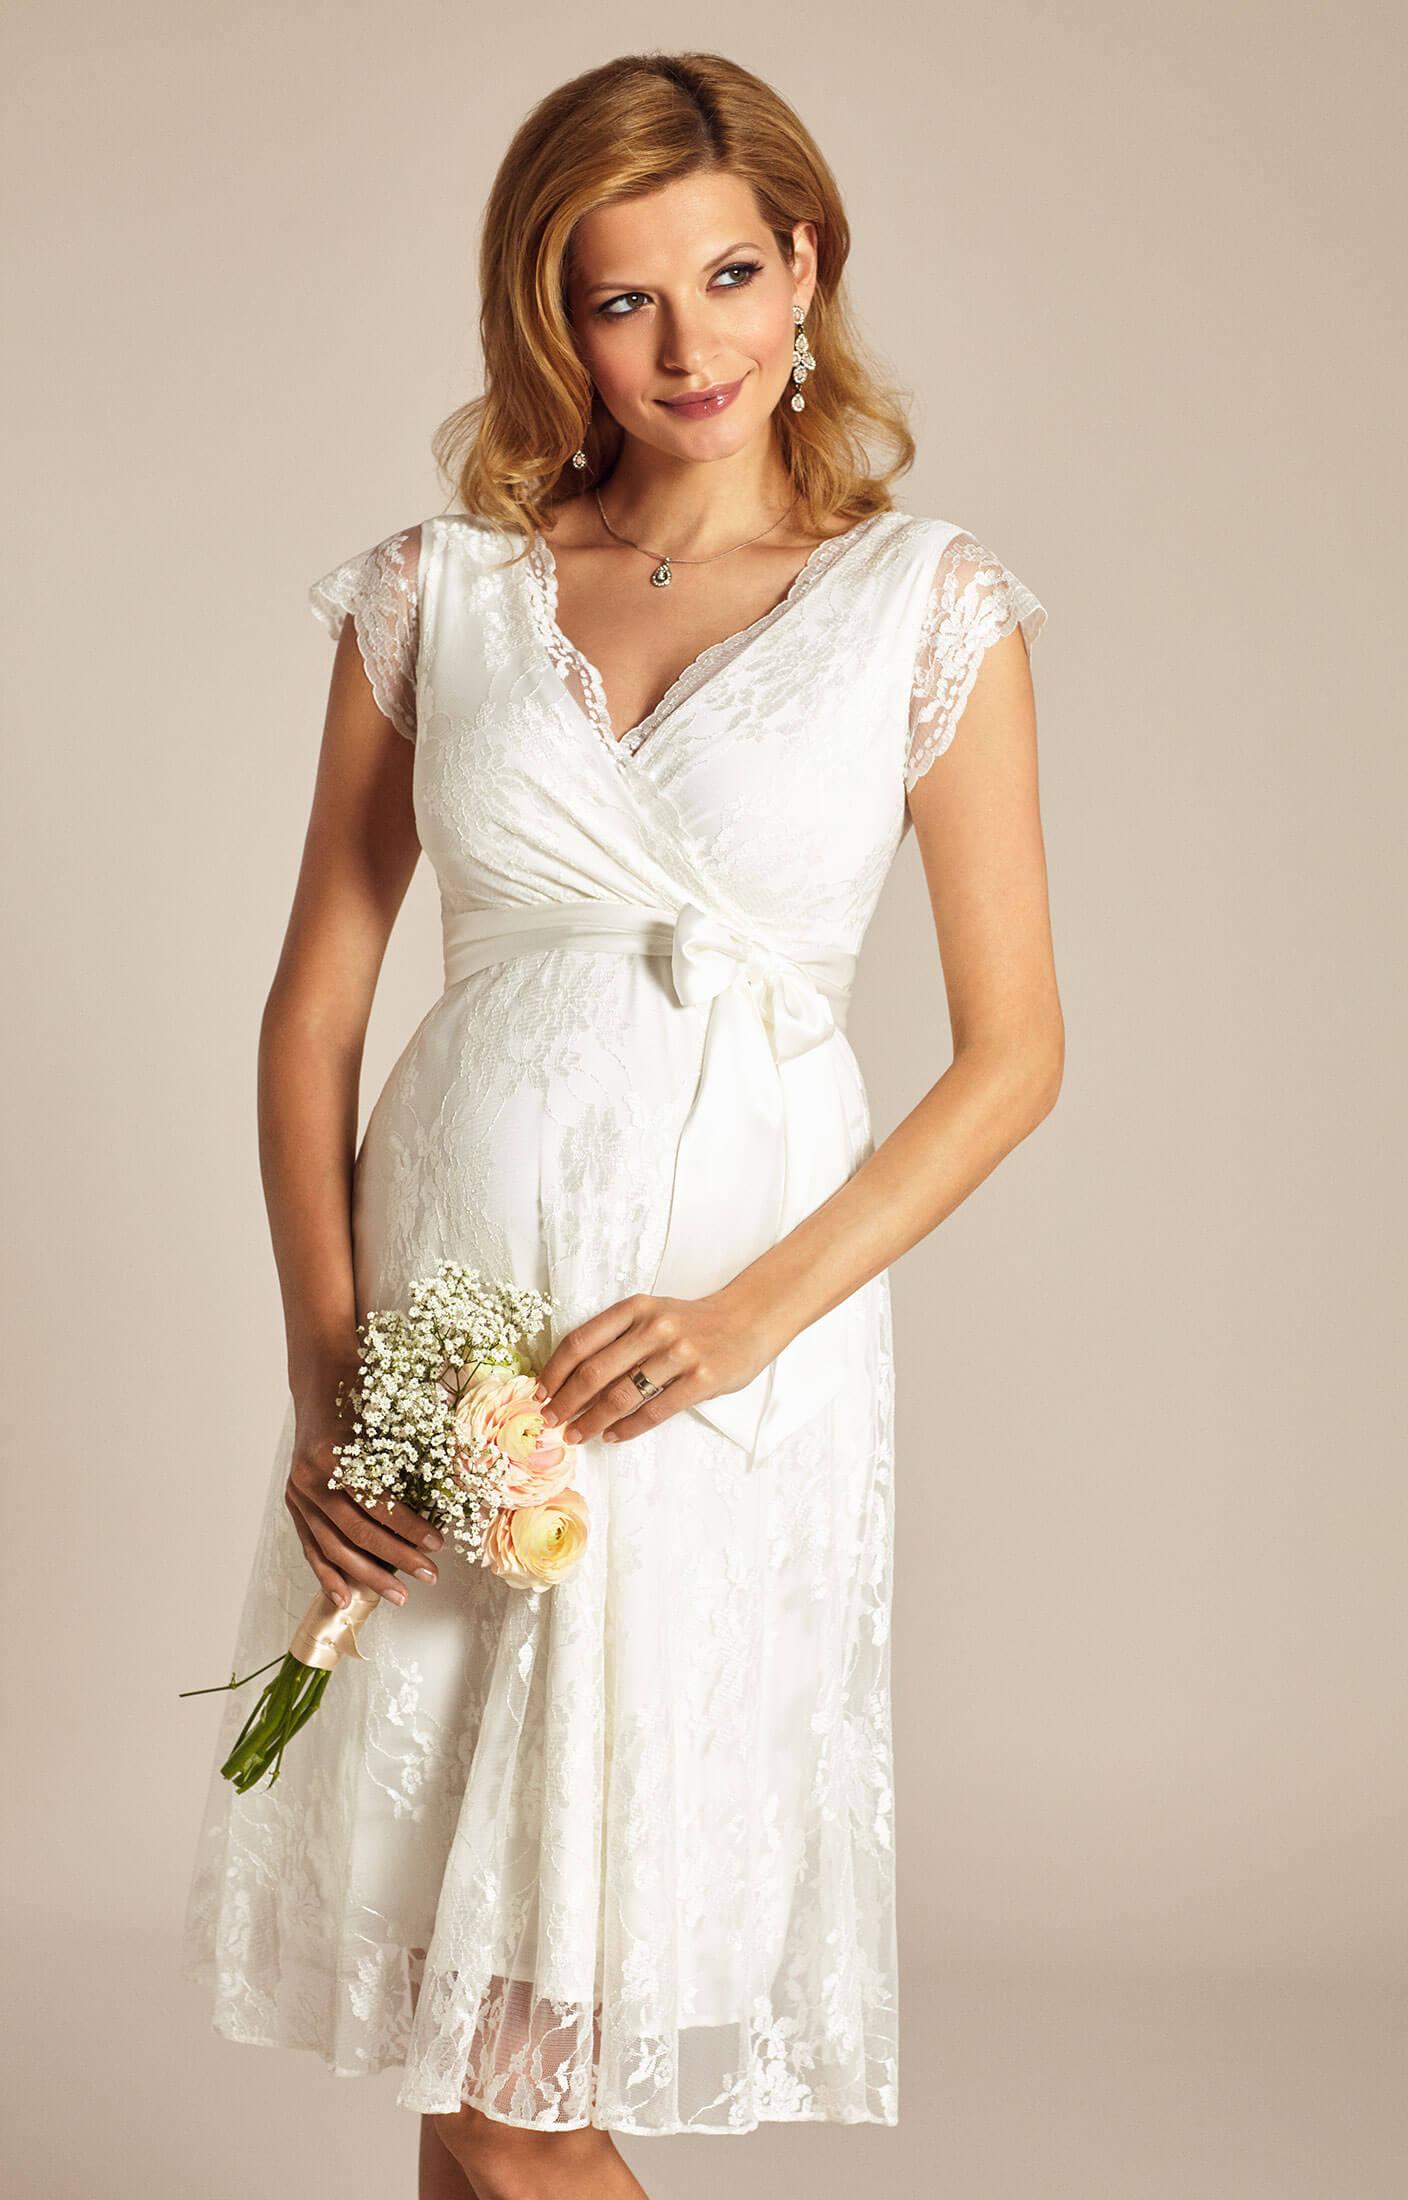 Eden maternity wedding dress ivory dream maternity for Maternity dresses for wedding party